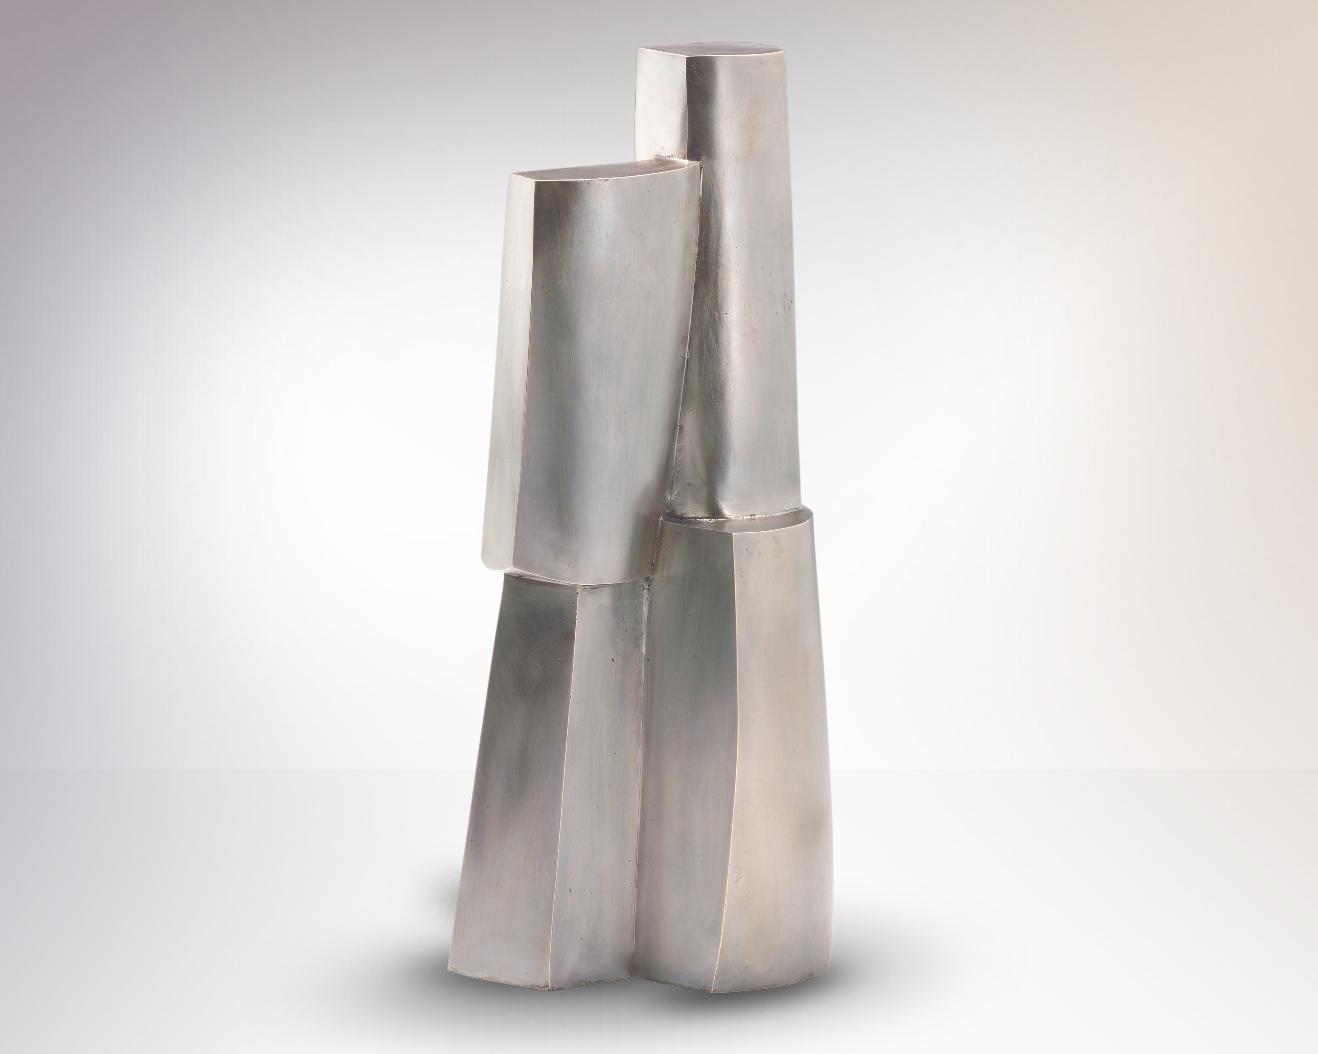 Turm I, sculpture en argentan, alliage de cuivre, de nickel et de zinc, 47 x 20 x 15 cm